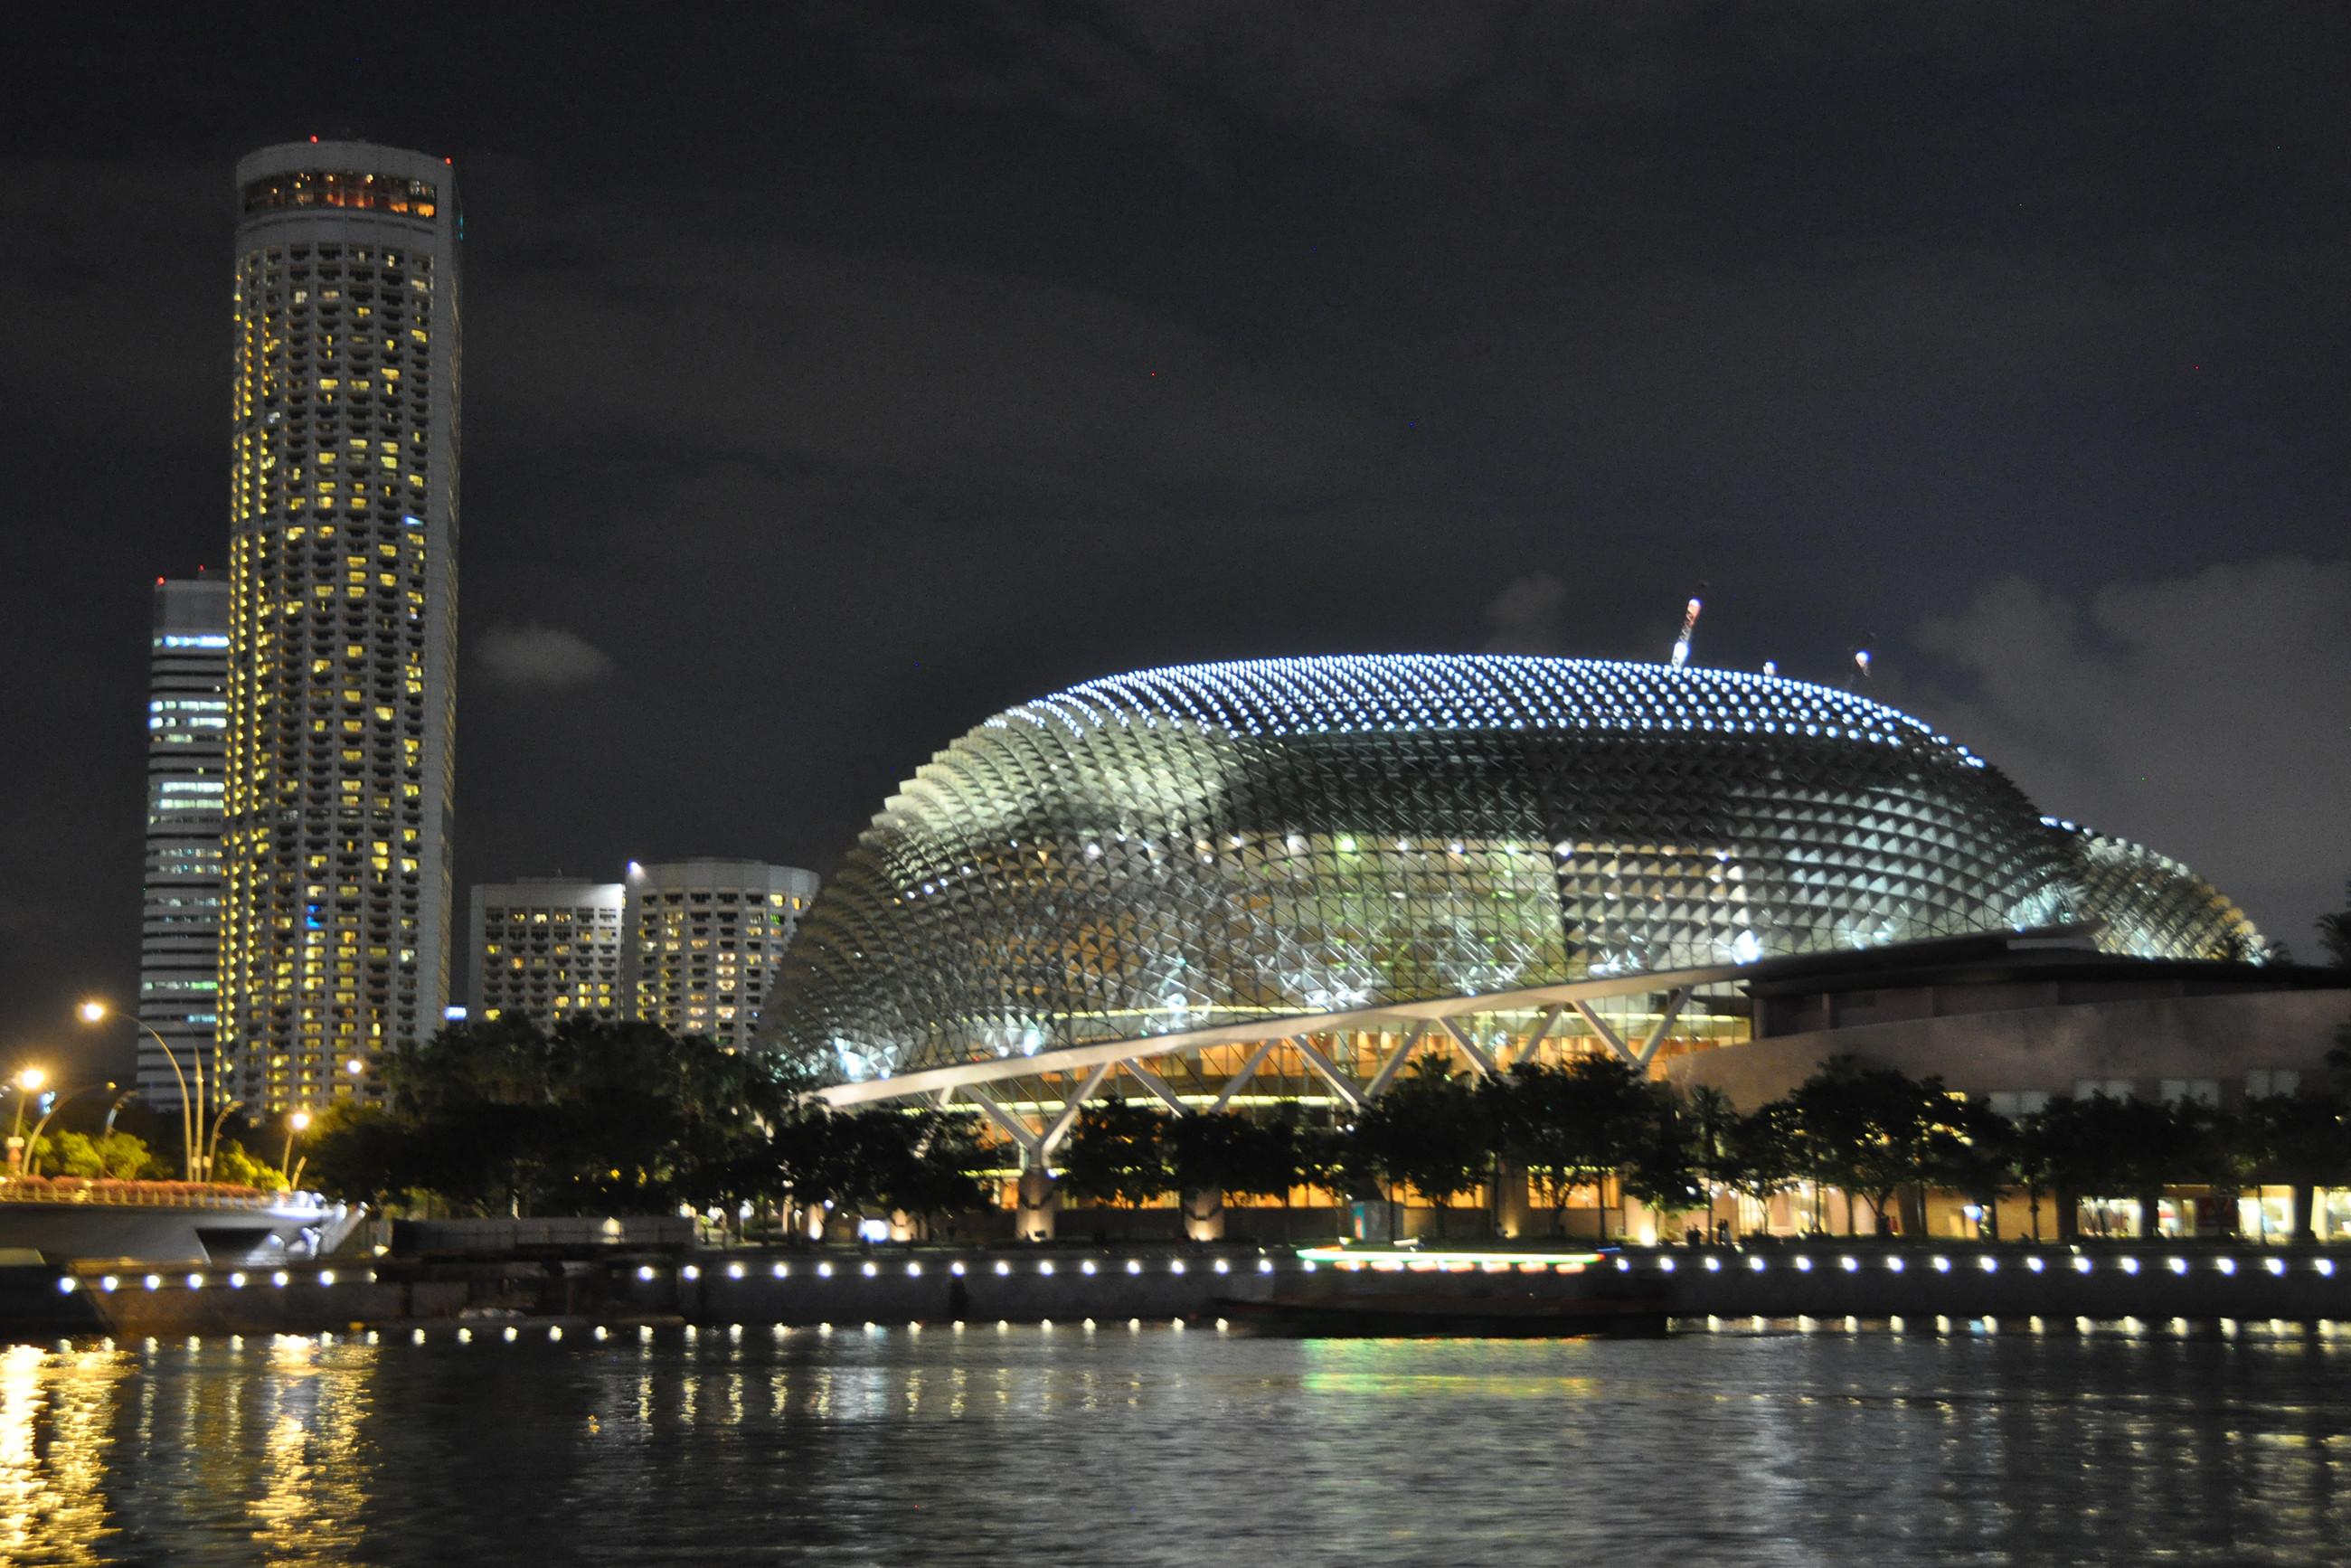 https://bubo.sk/uploads/galleries/5035/tomaskubus_singapur_dsc_0443.jpg